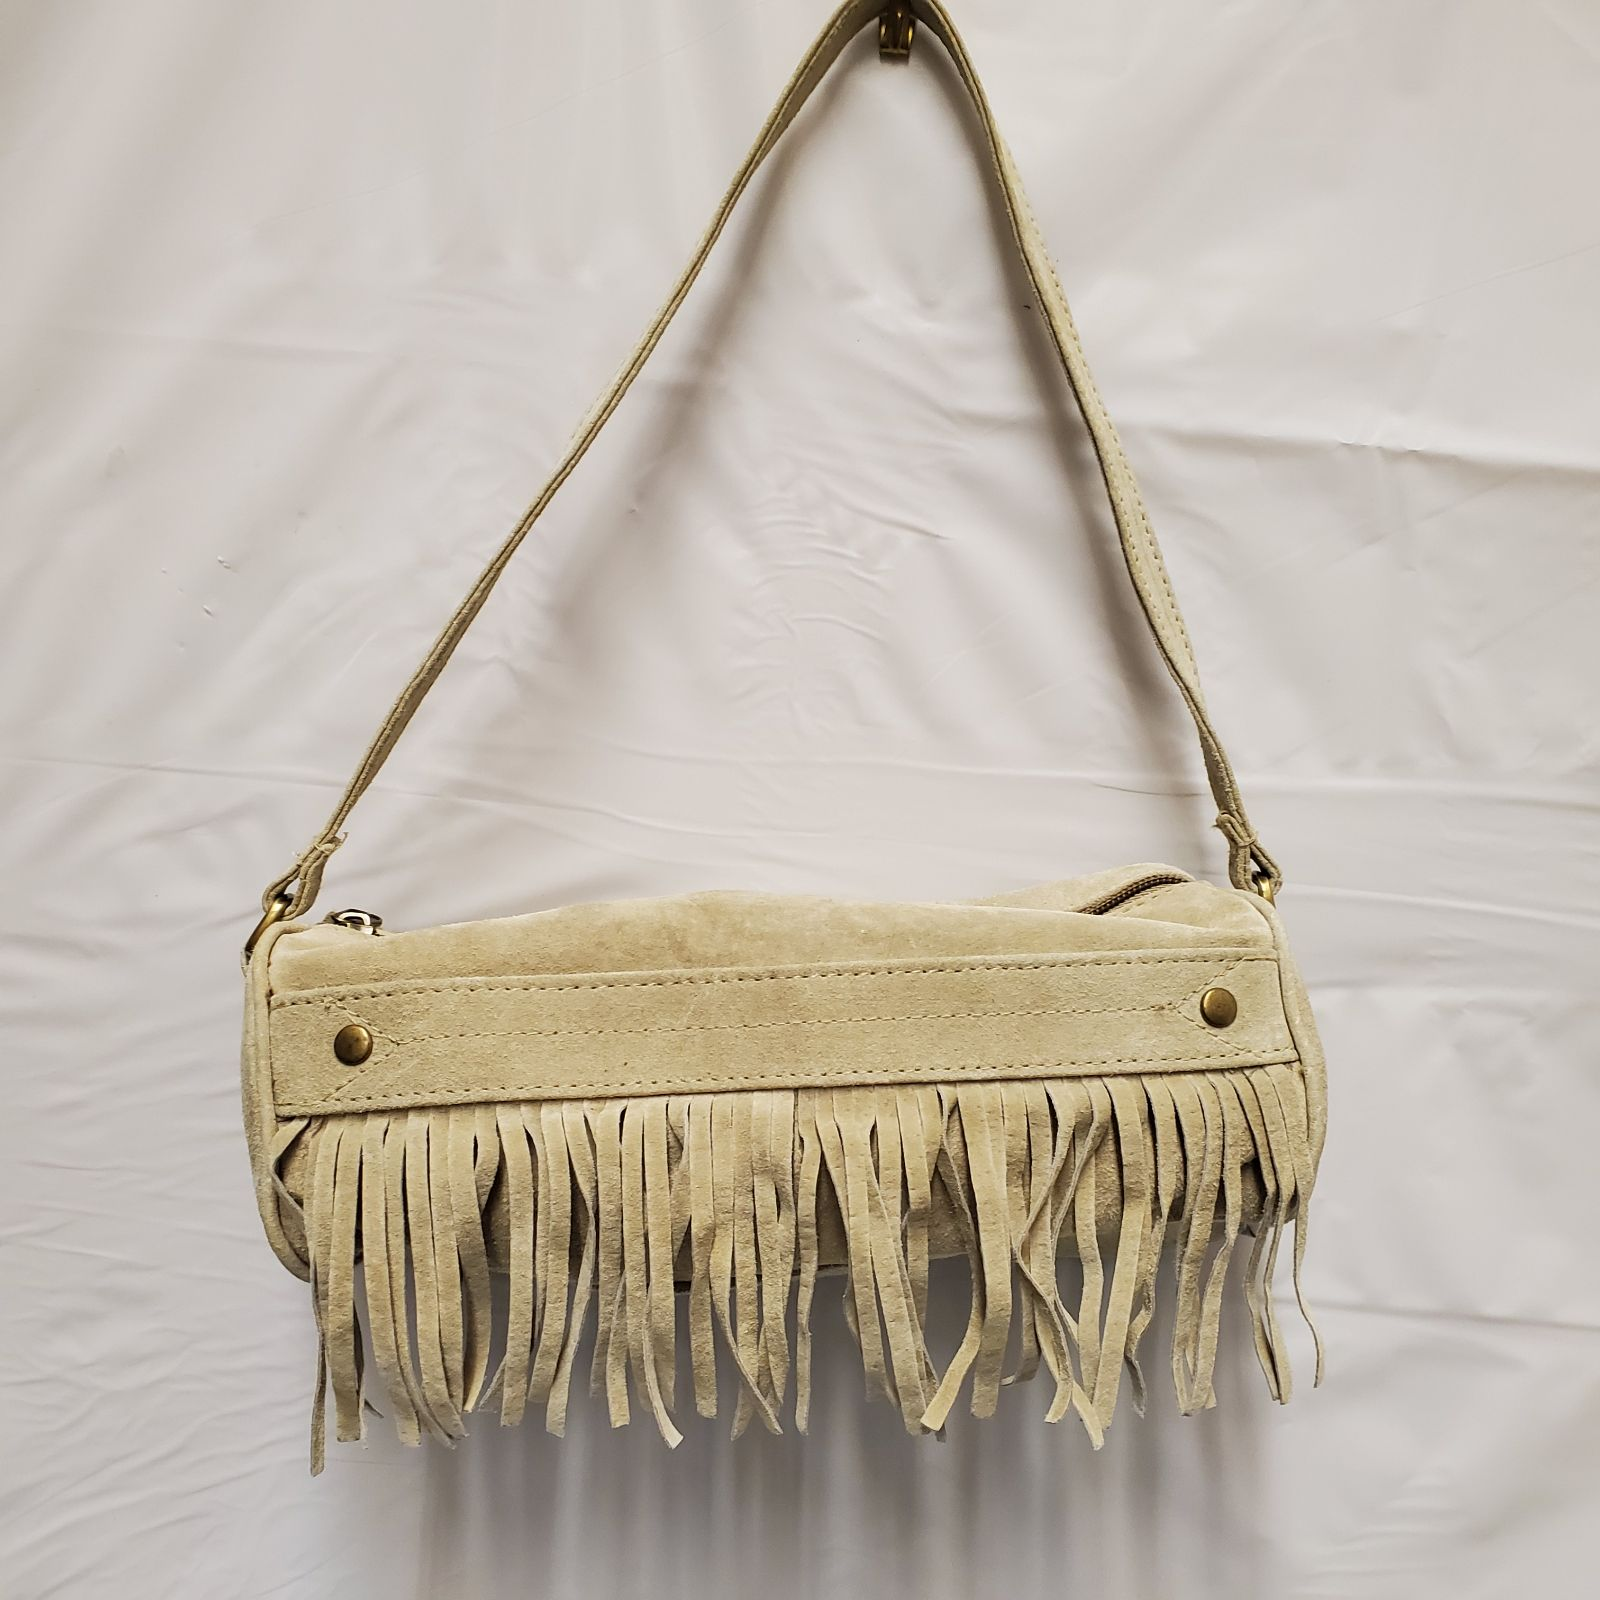 Candies Small Beige Suede Shoulder Bag